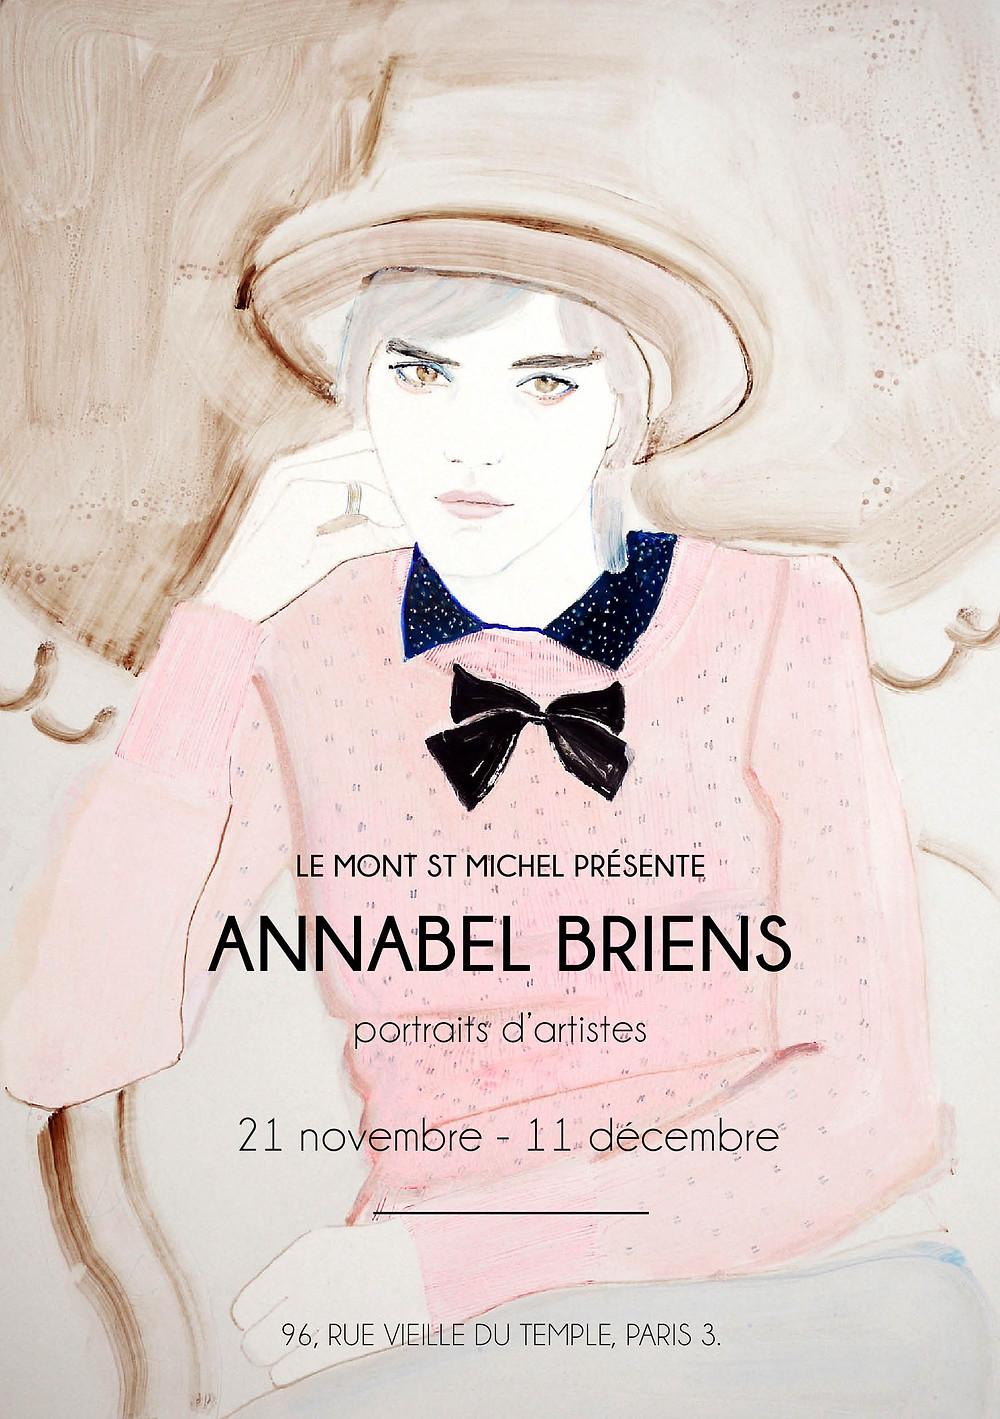 ANNABELBRIENS-INVITATION-BLOG.jpg